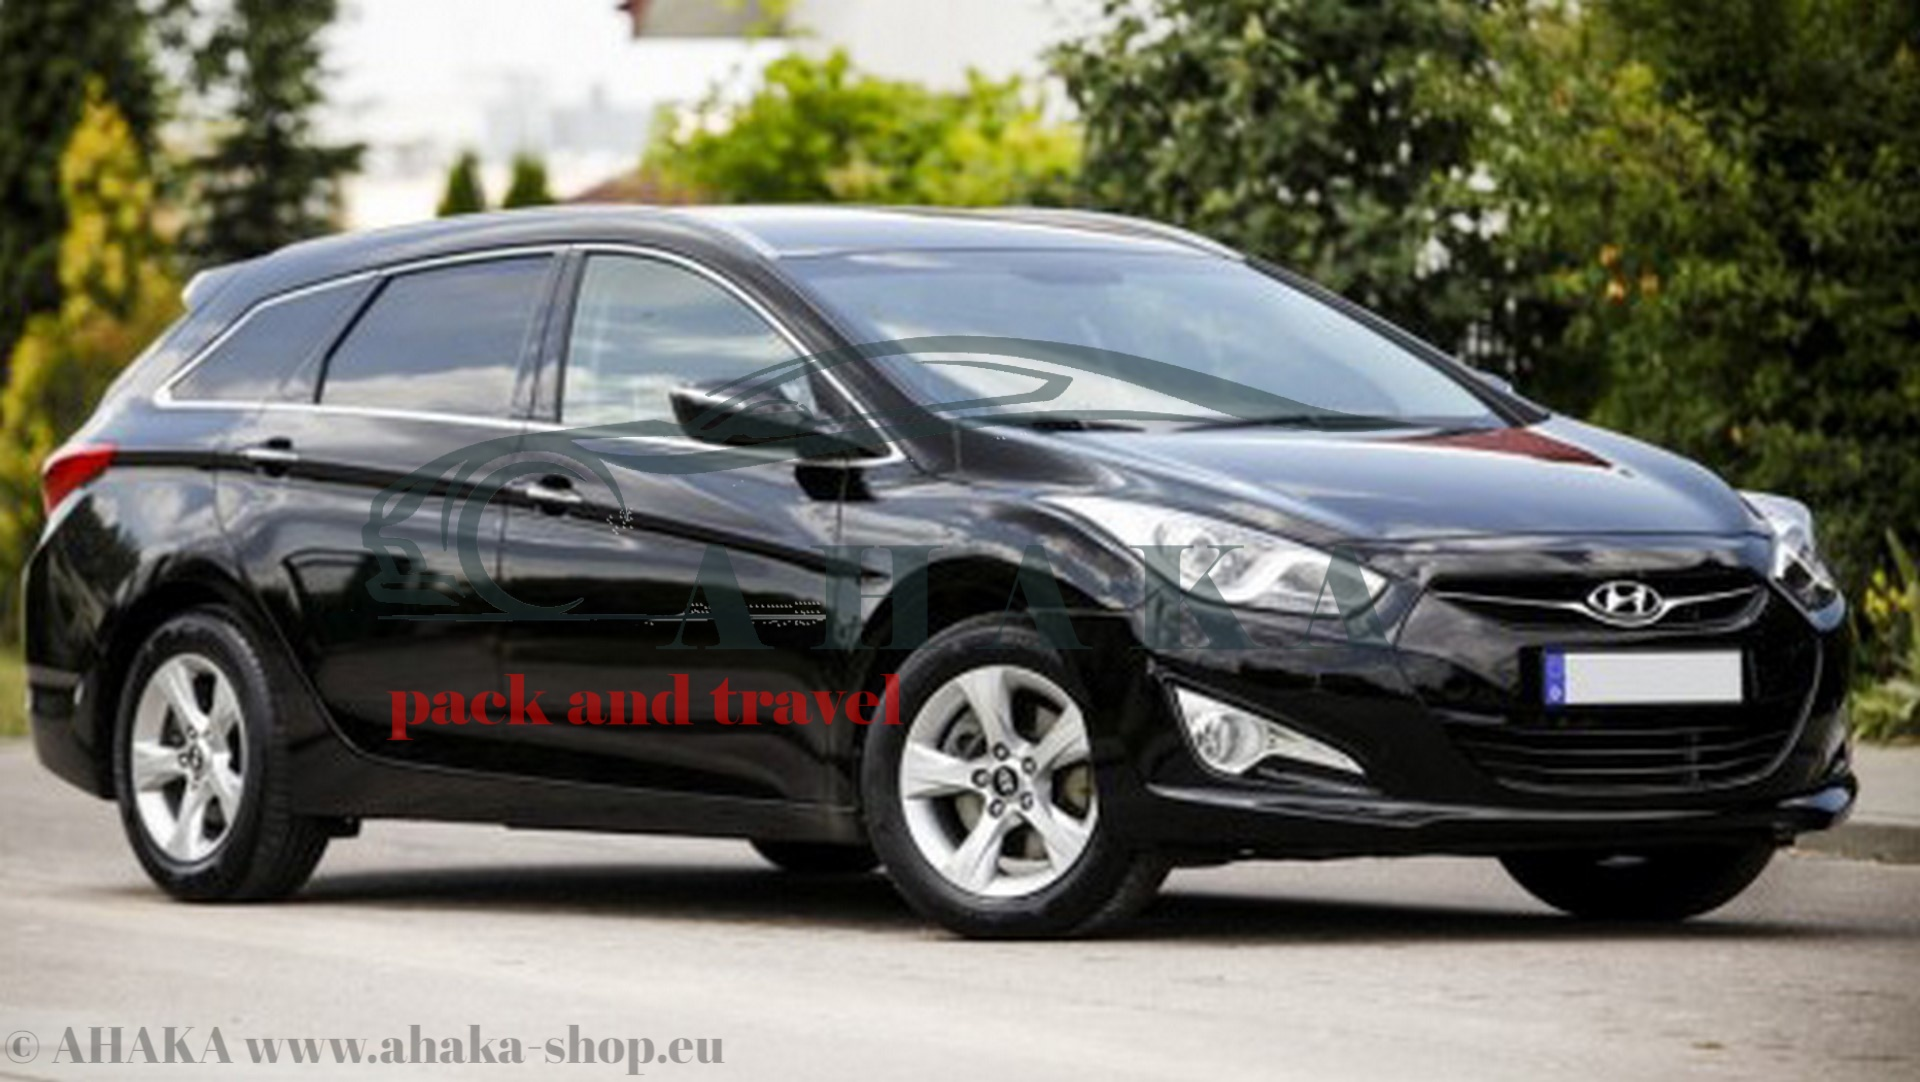 Hyundai i30 CW Kombi 2012-2017 AUTO HAK Anhängerkupplung abnehmbar AHK NEU AHZV